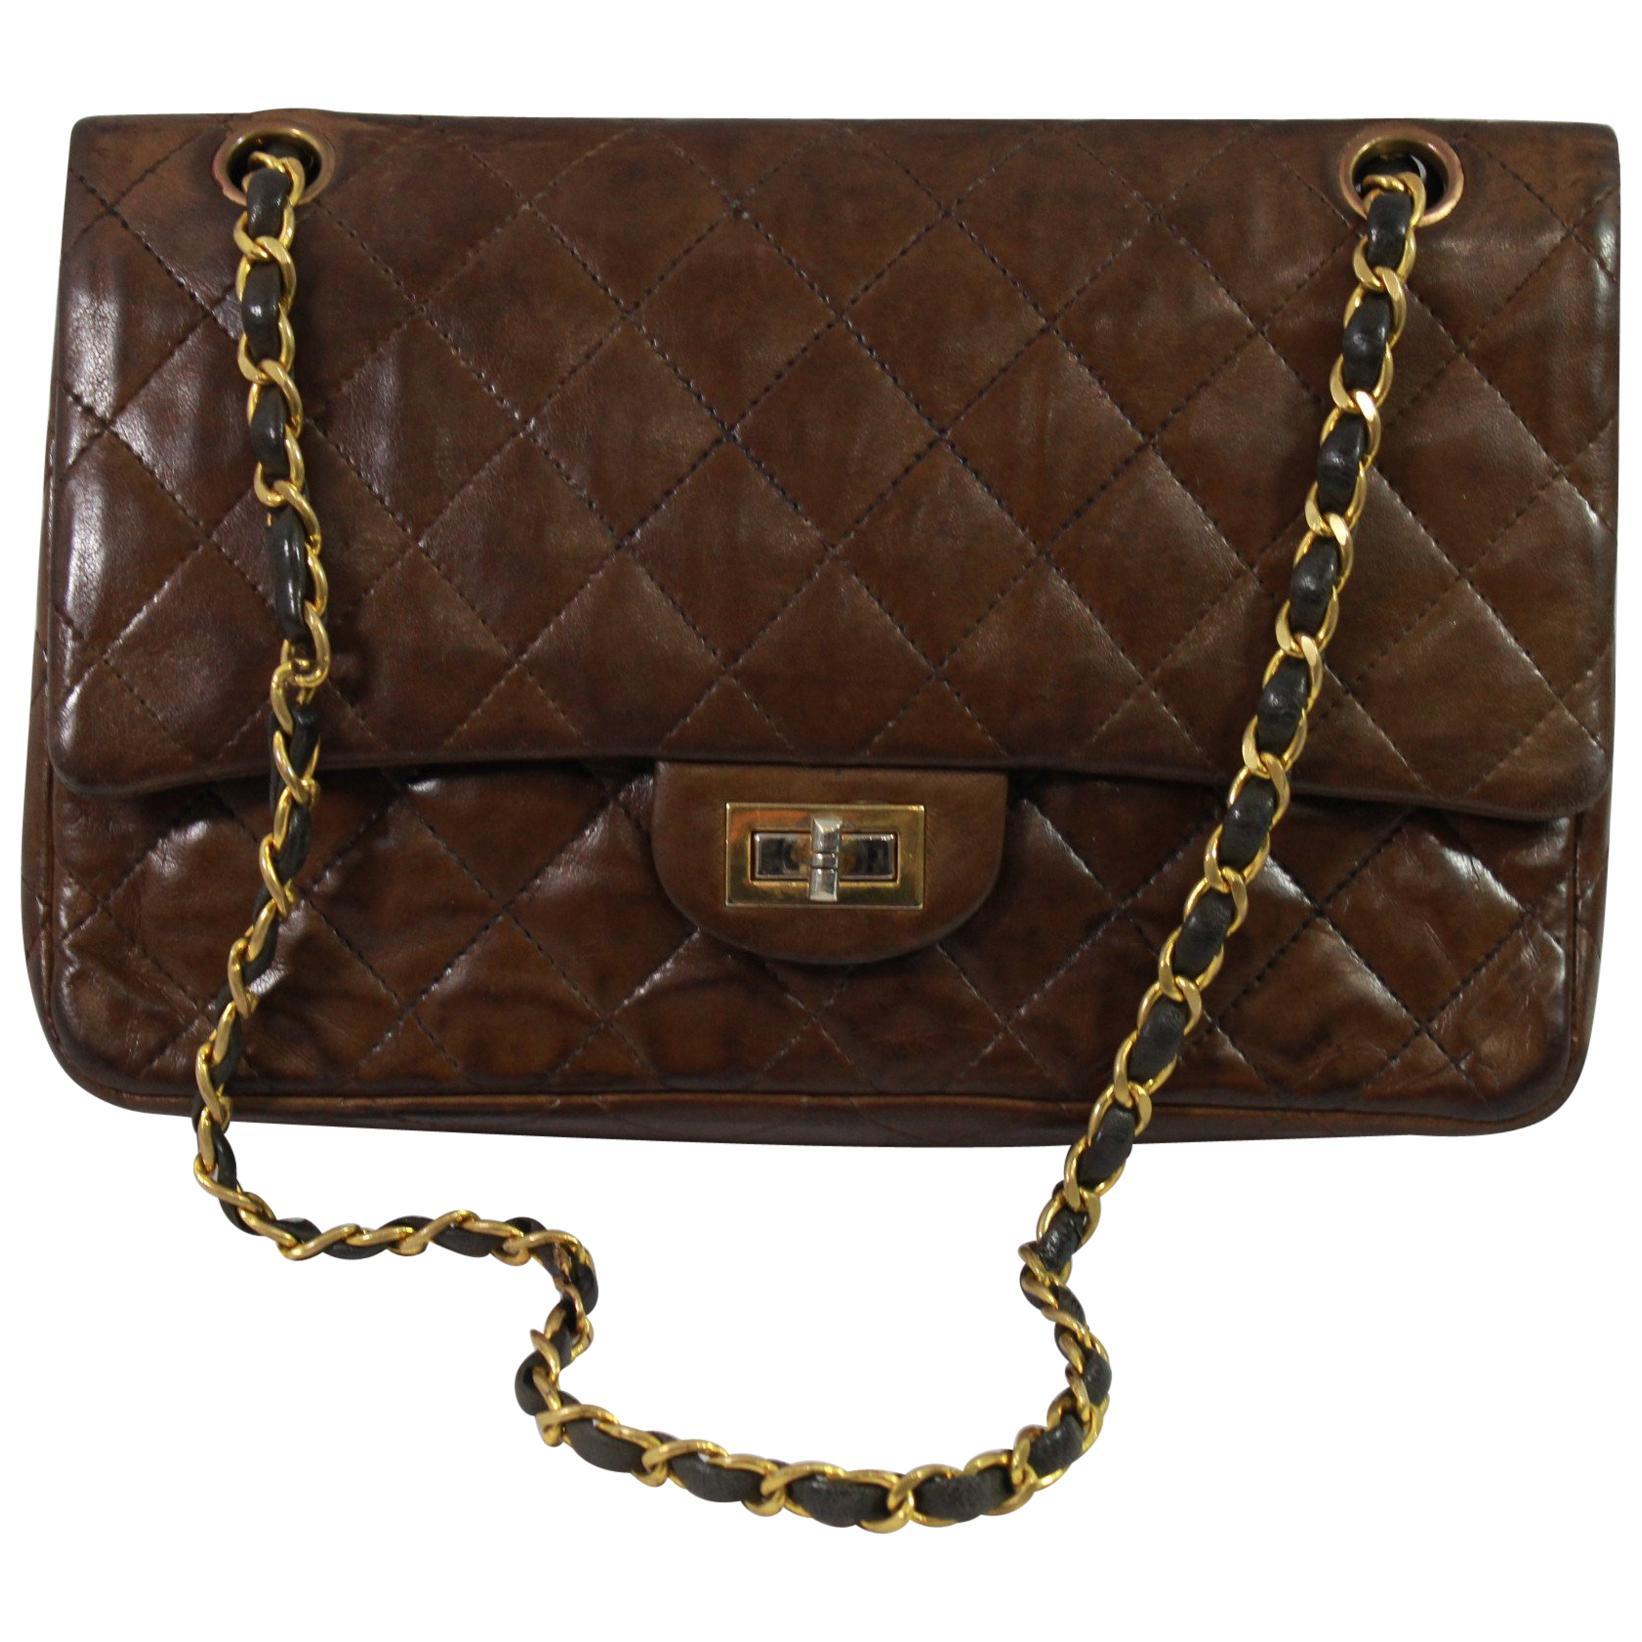 020174a0c27f Vintage 80's Chanel 2.55 Bag in Brown Letaher and Golden Hardware. size 10